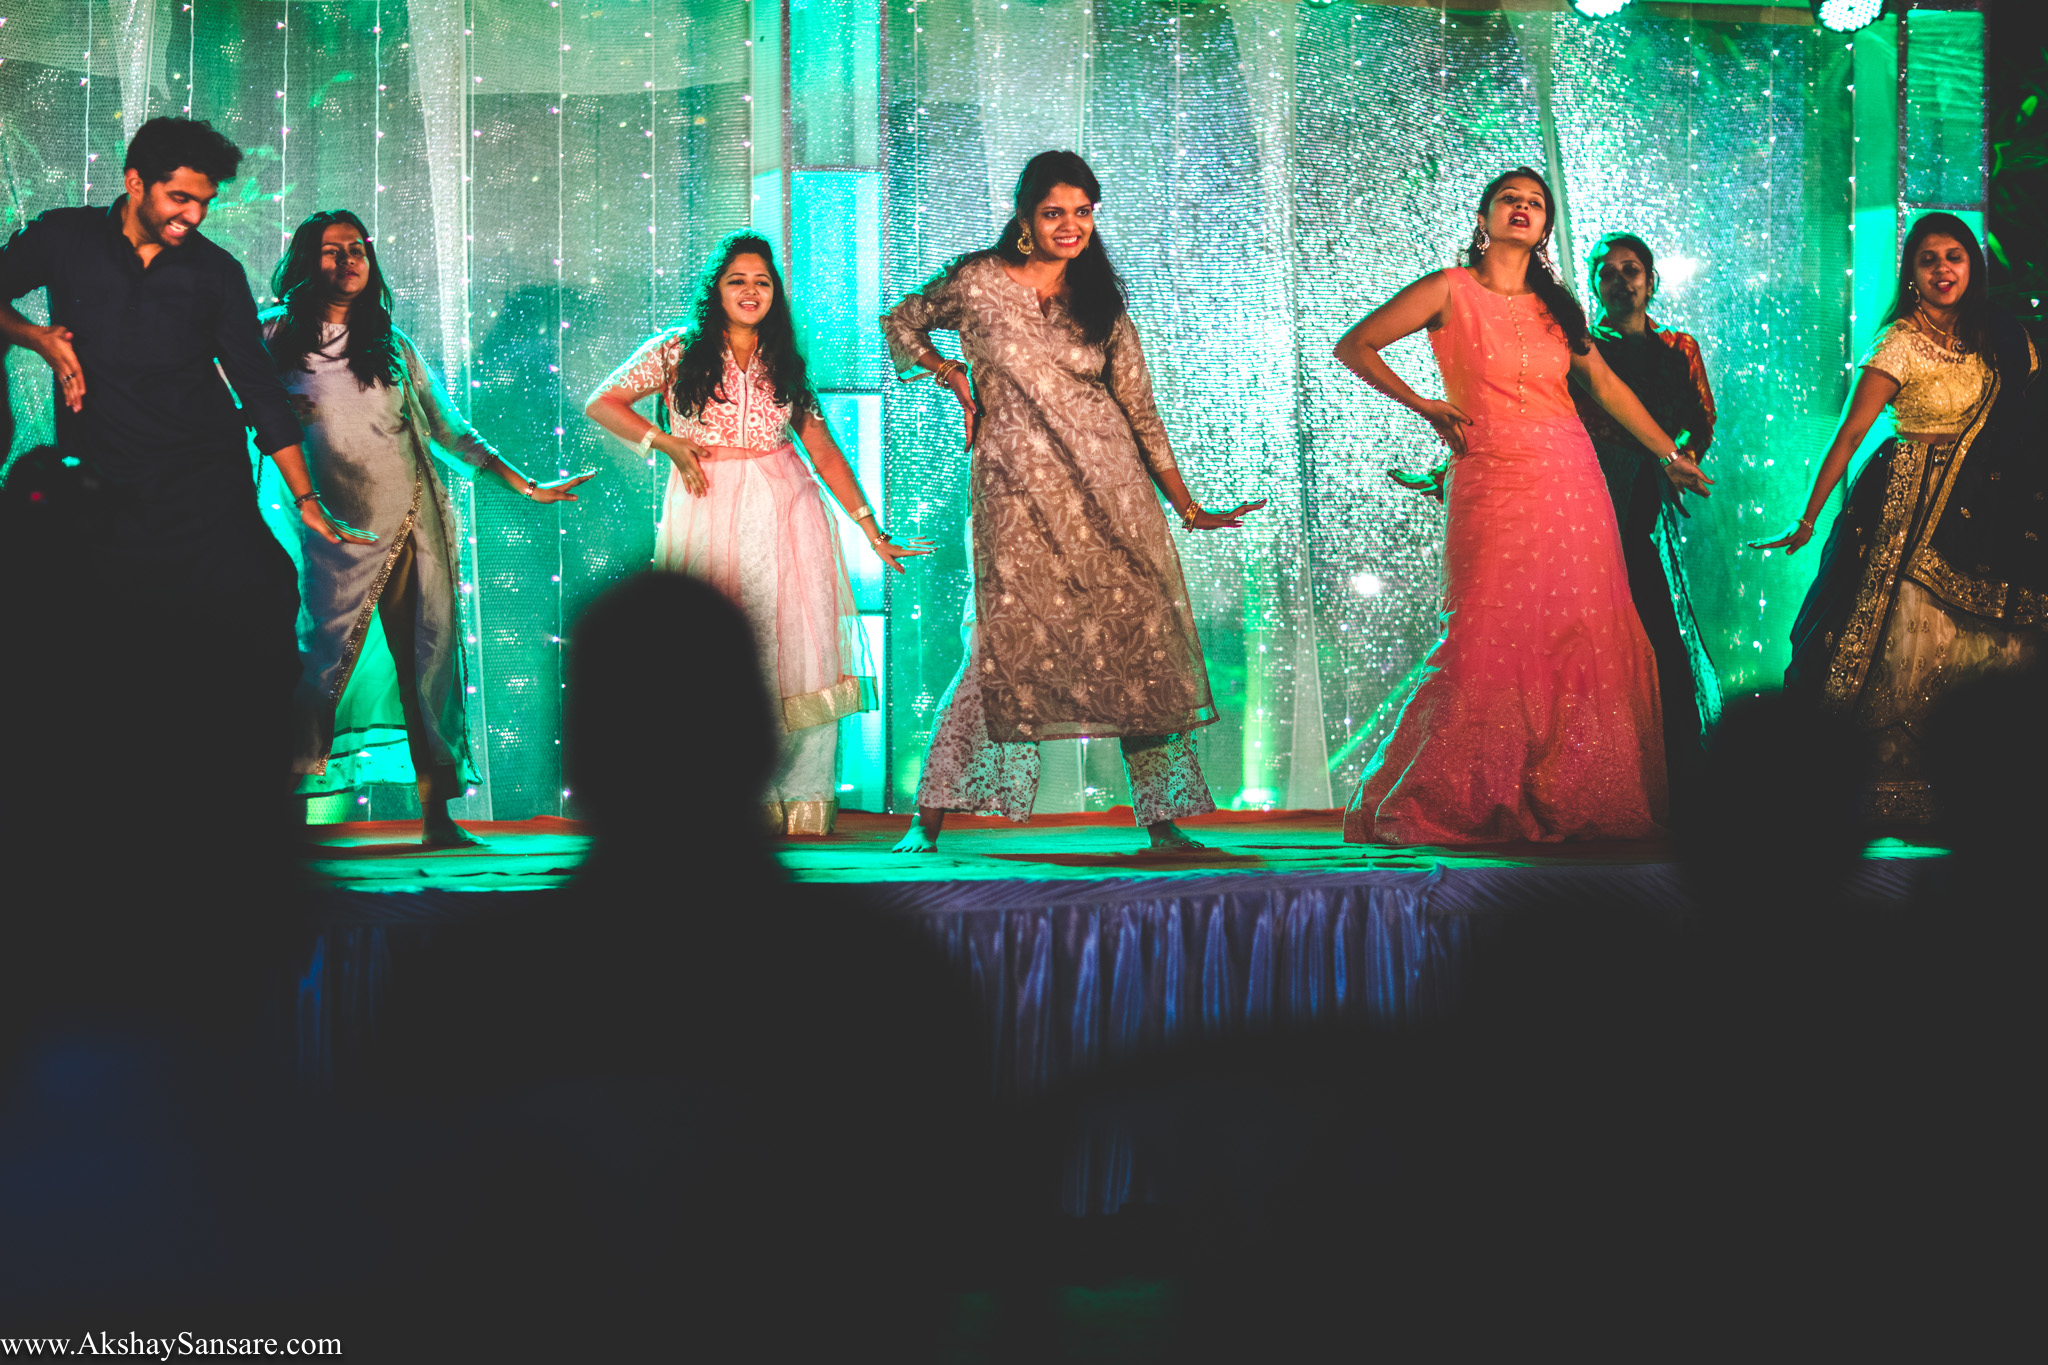 Salil x Kimaya Akshay Sansare Photography Candid wedding Photographer in mumbai best(6).jpg